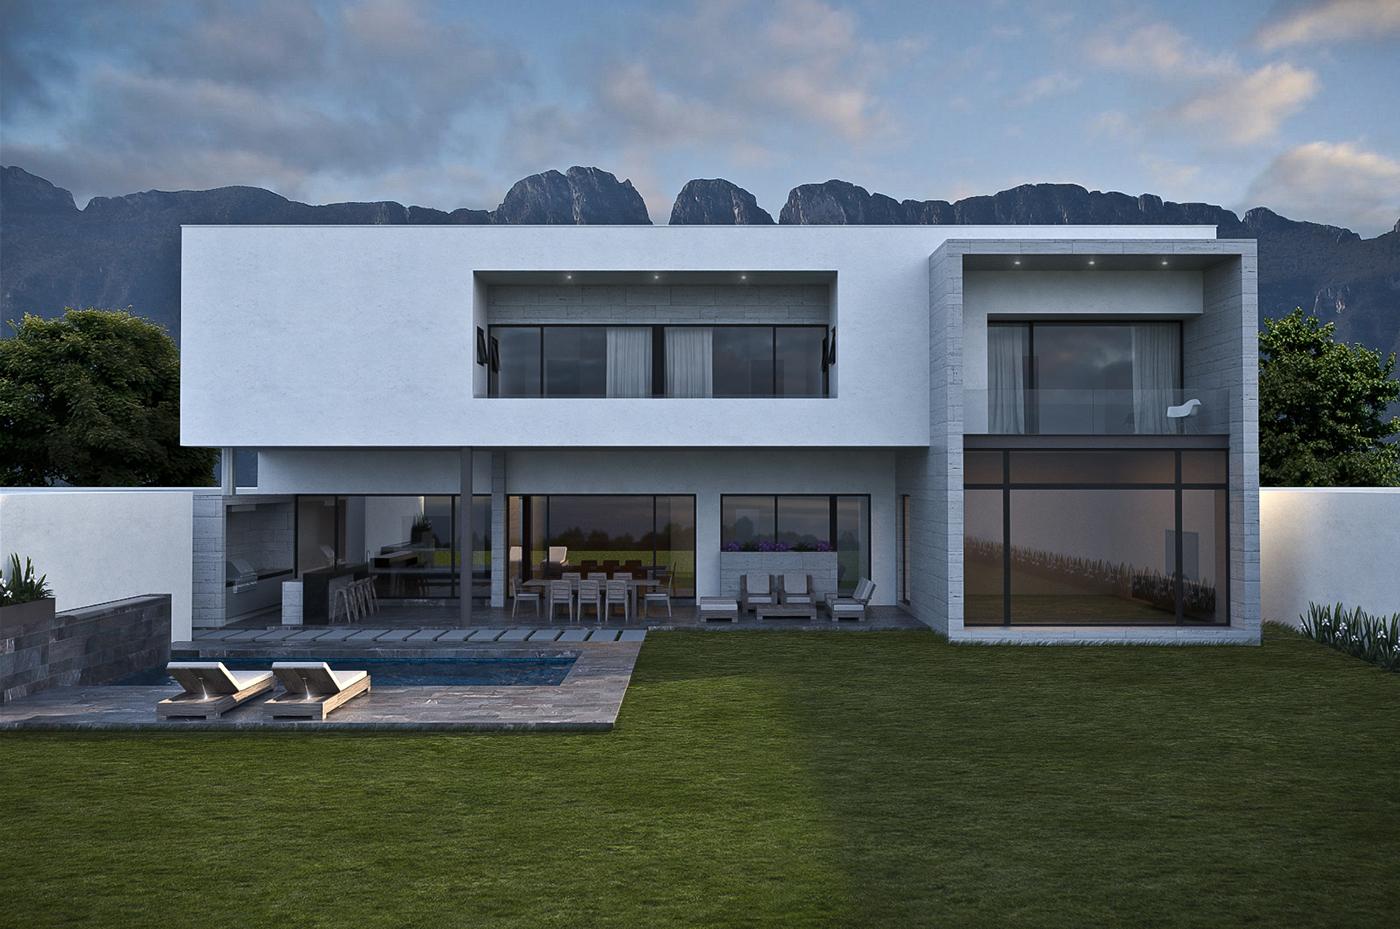 Adobe Portfolio,residential,housing,house,exterior